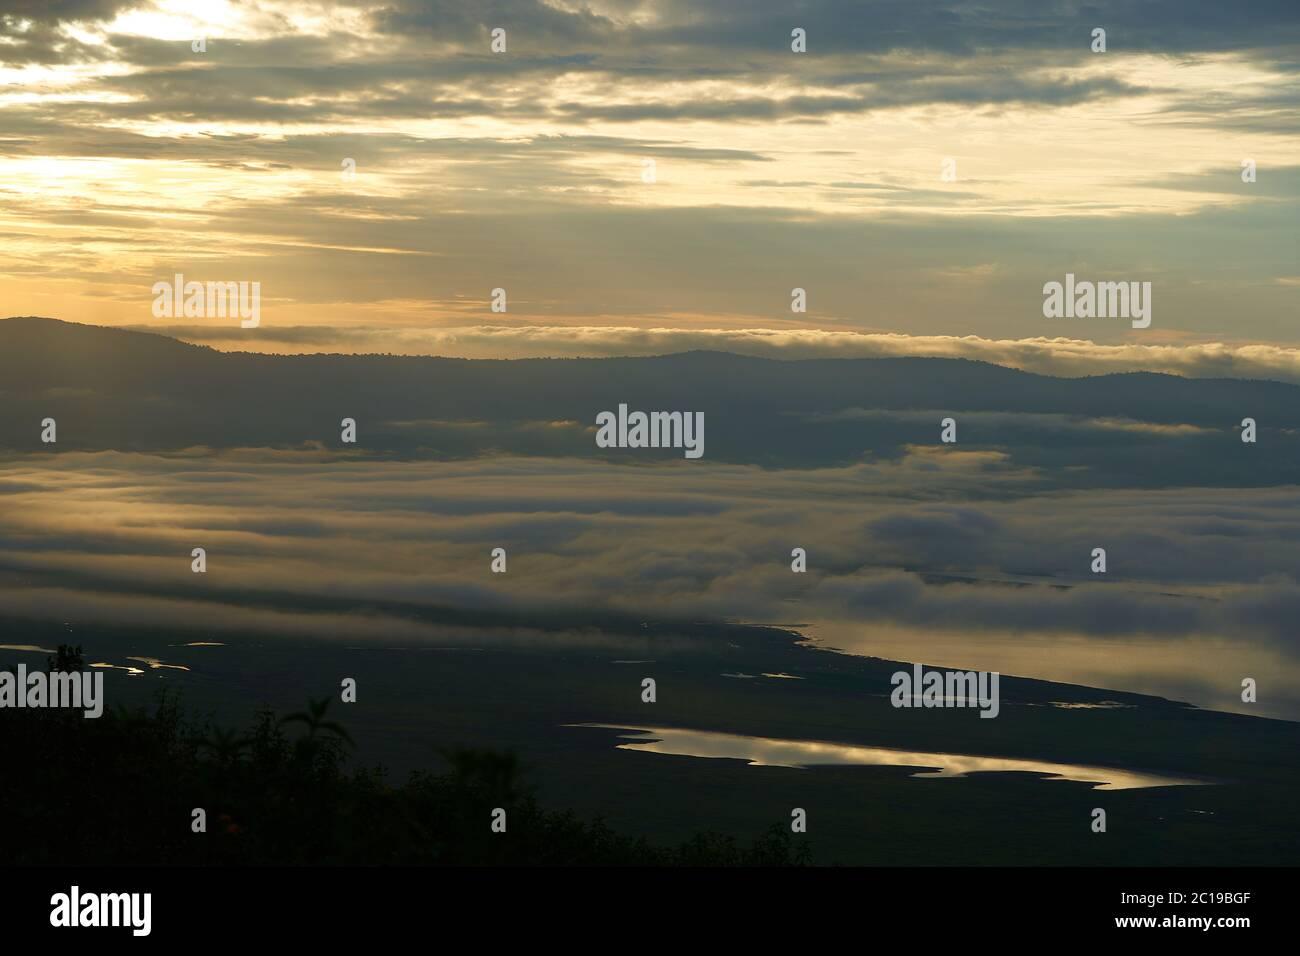 Ngorongoro Crater Tanzania Serengeti África mañana paisaje paisaje paisaje escénico amanecer Foto de stock